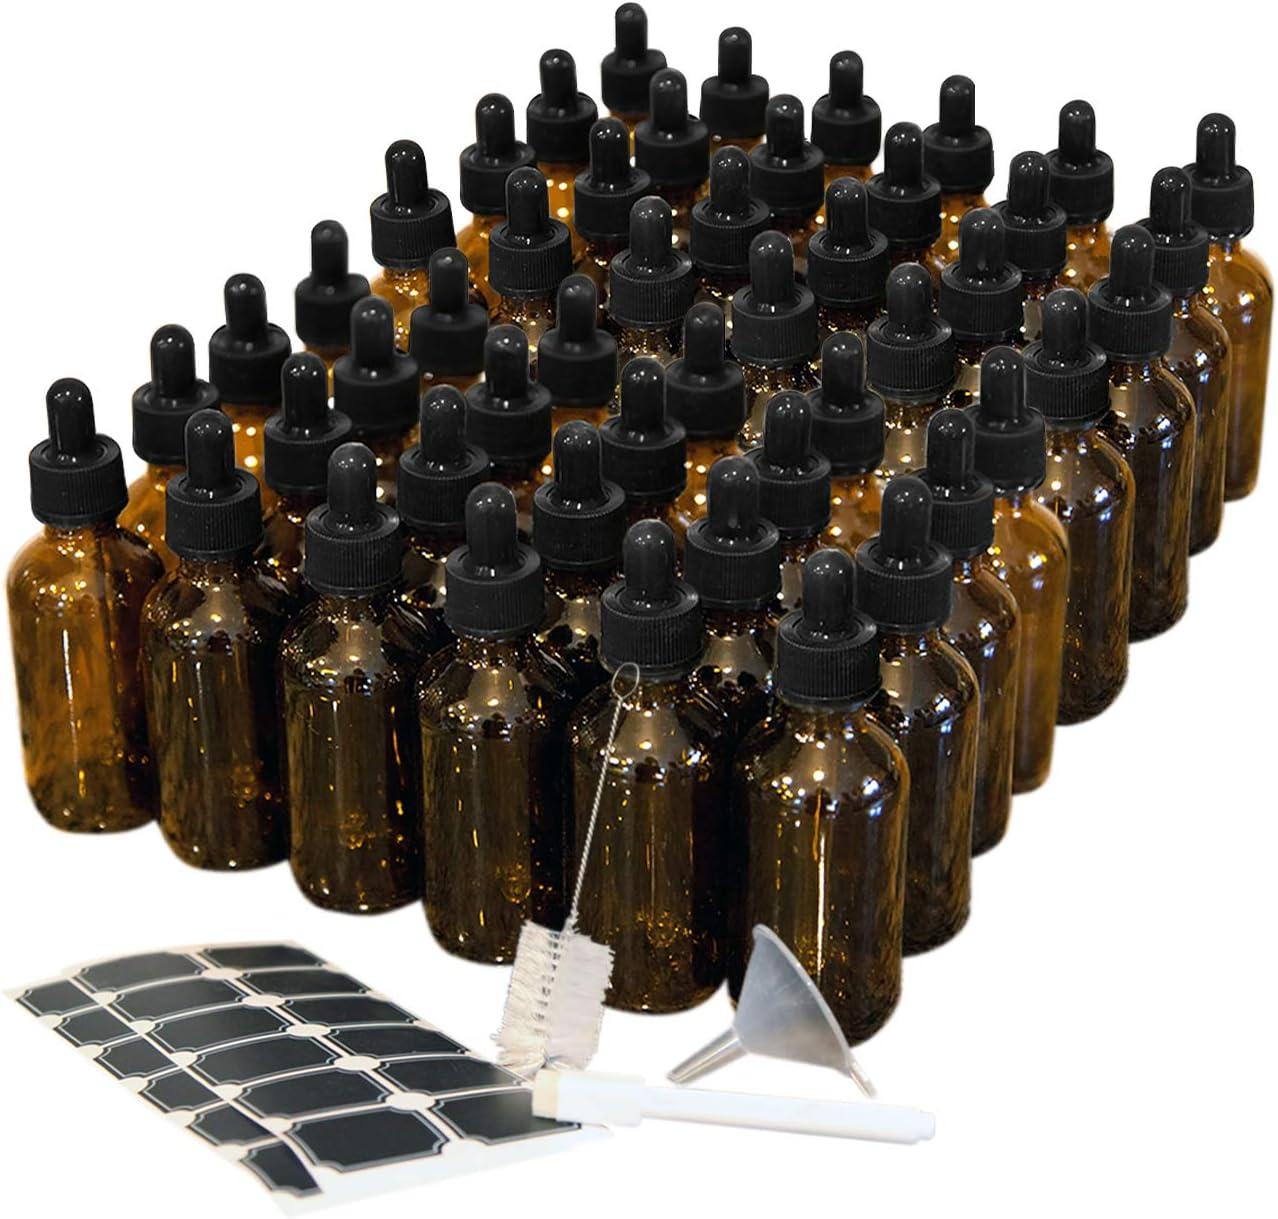 Mockins 48 pack Amber 2 Oz Glass Dropper Bottles   The Amber Glass Bottles Includes a Dropper & Funnel and Brush with Bonus Labels to Mark Each One